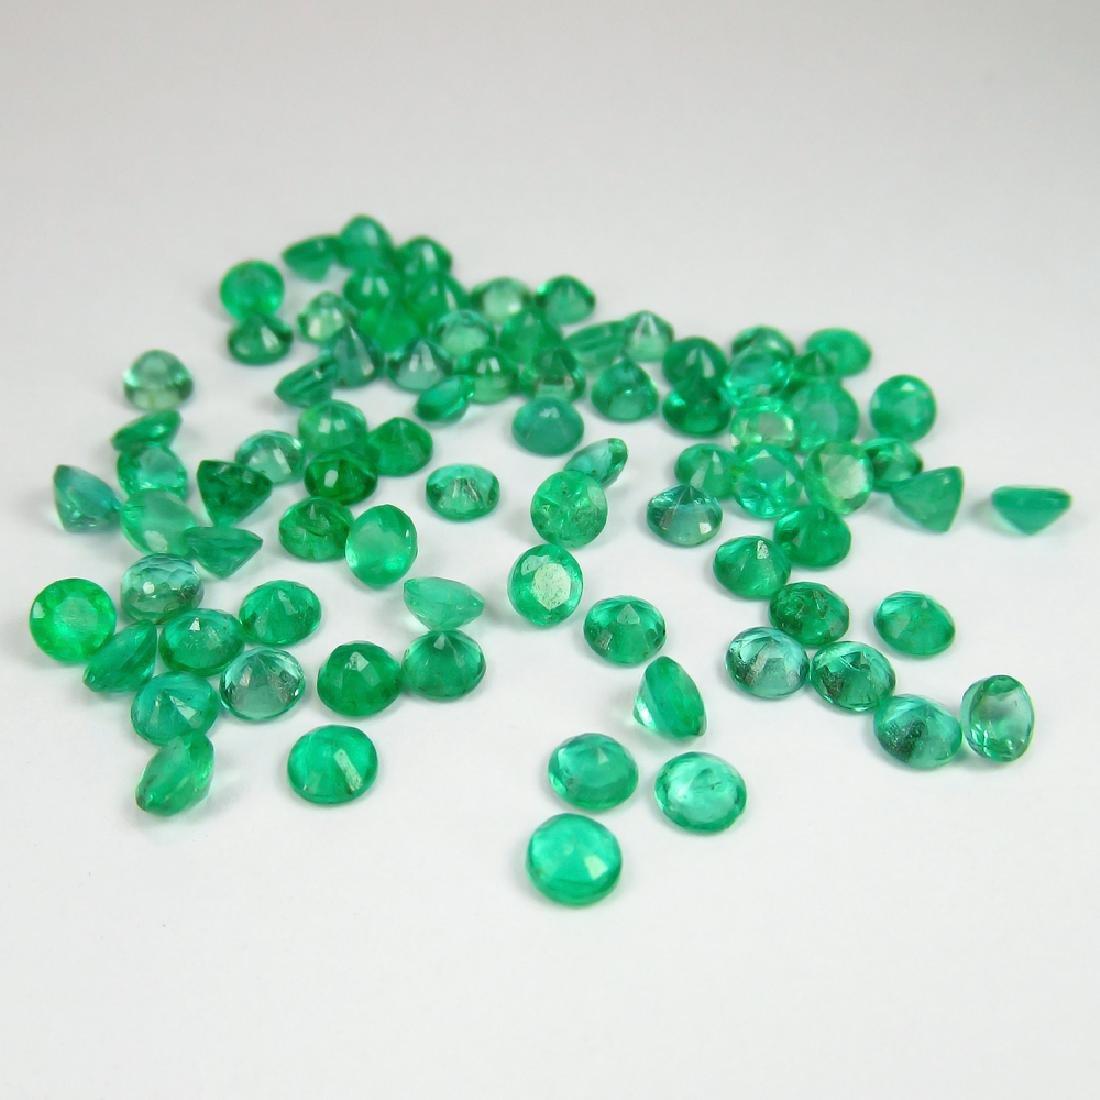 14.66 Ctw Natural 81 Calibrate Emerald 3.5 mm Round